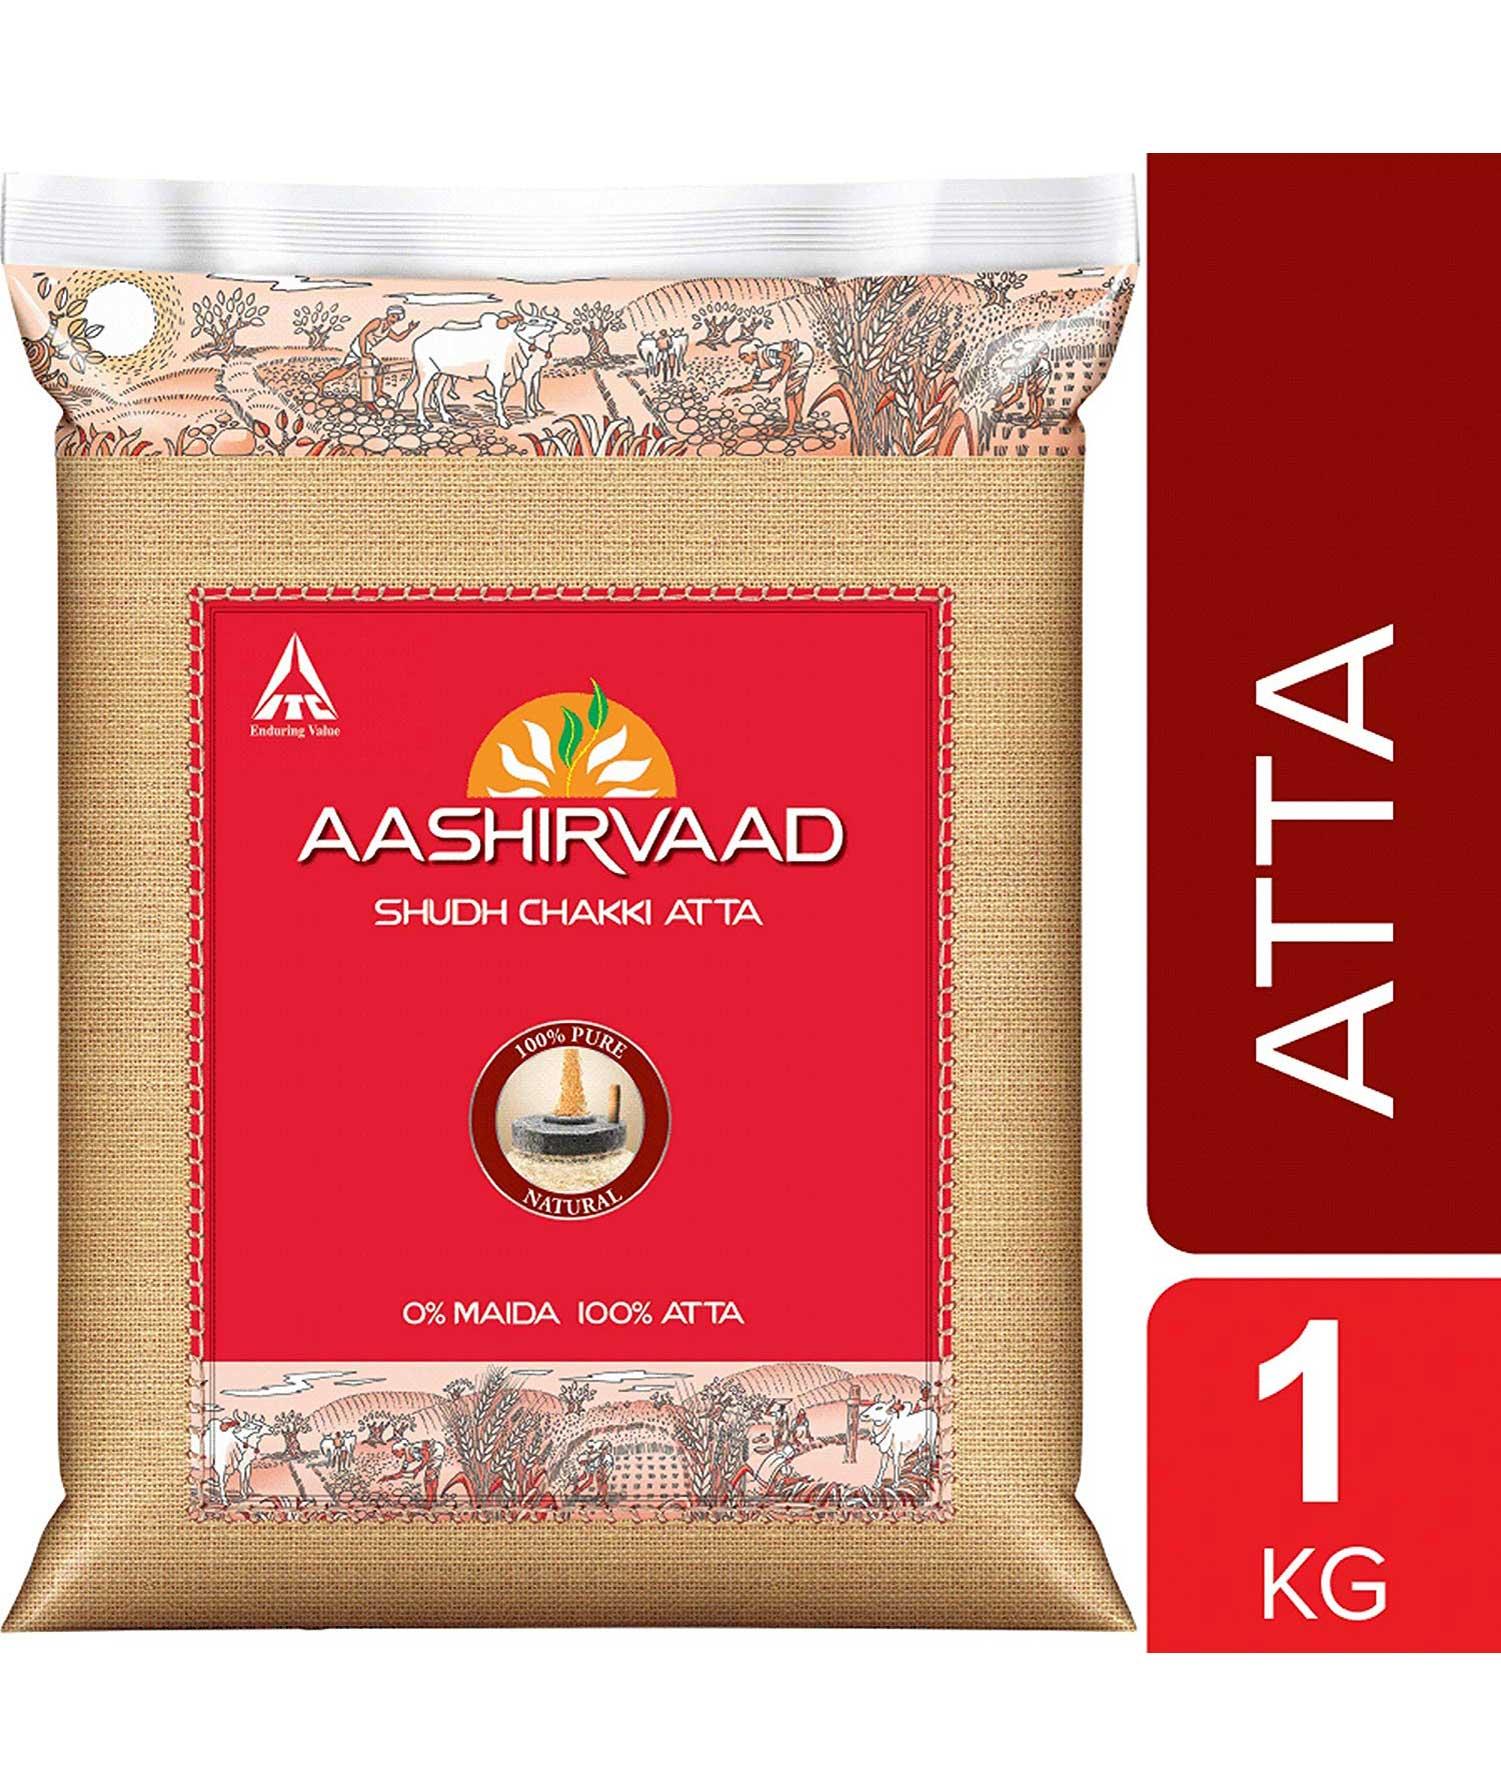 Aashirvaad Shudh Chakki Atta, 1 kgAashirvaad Shudh Chakki Atta, 1 kg